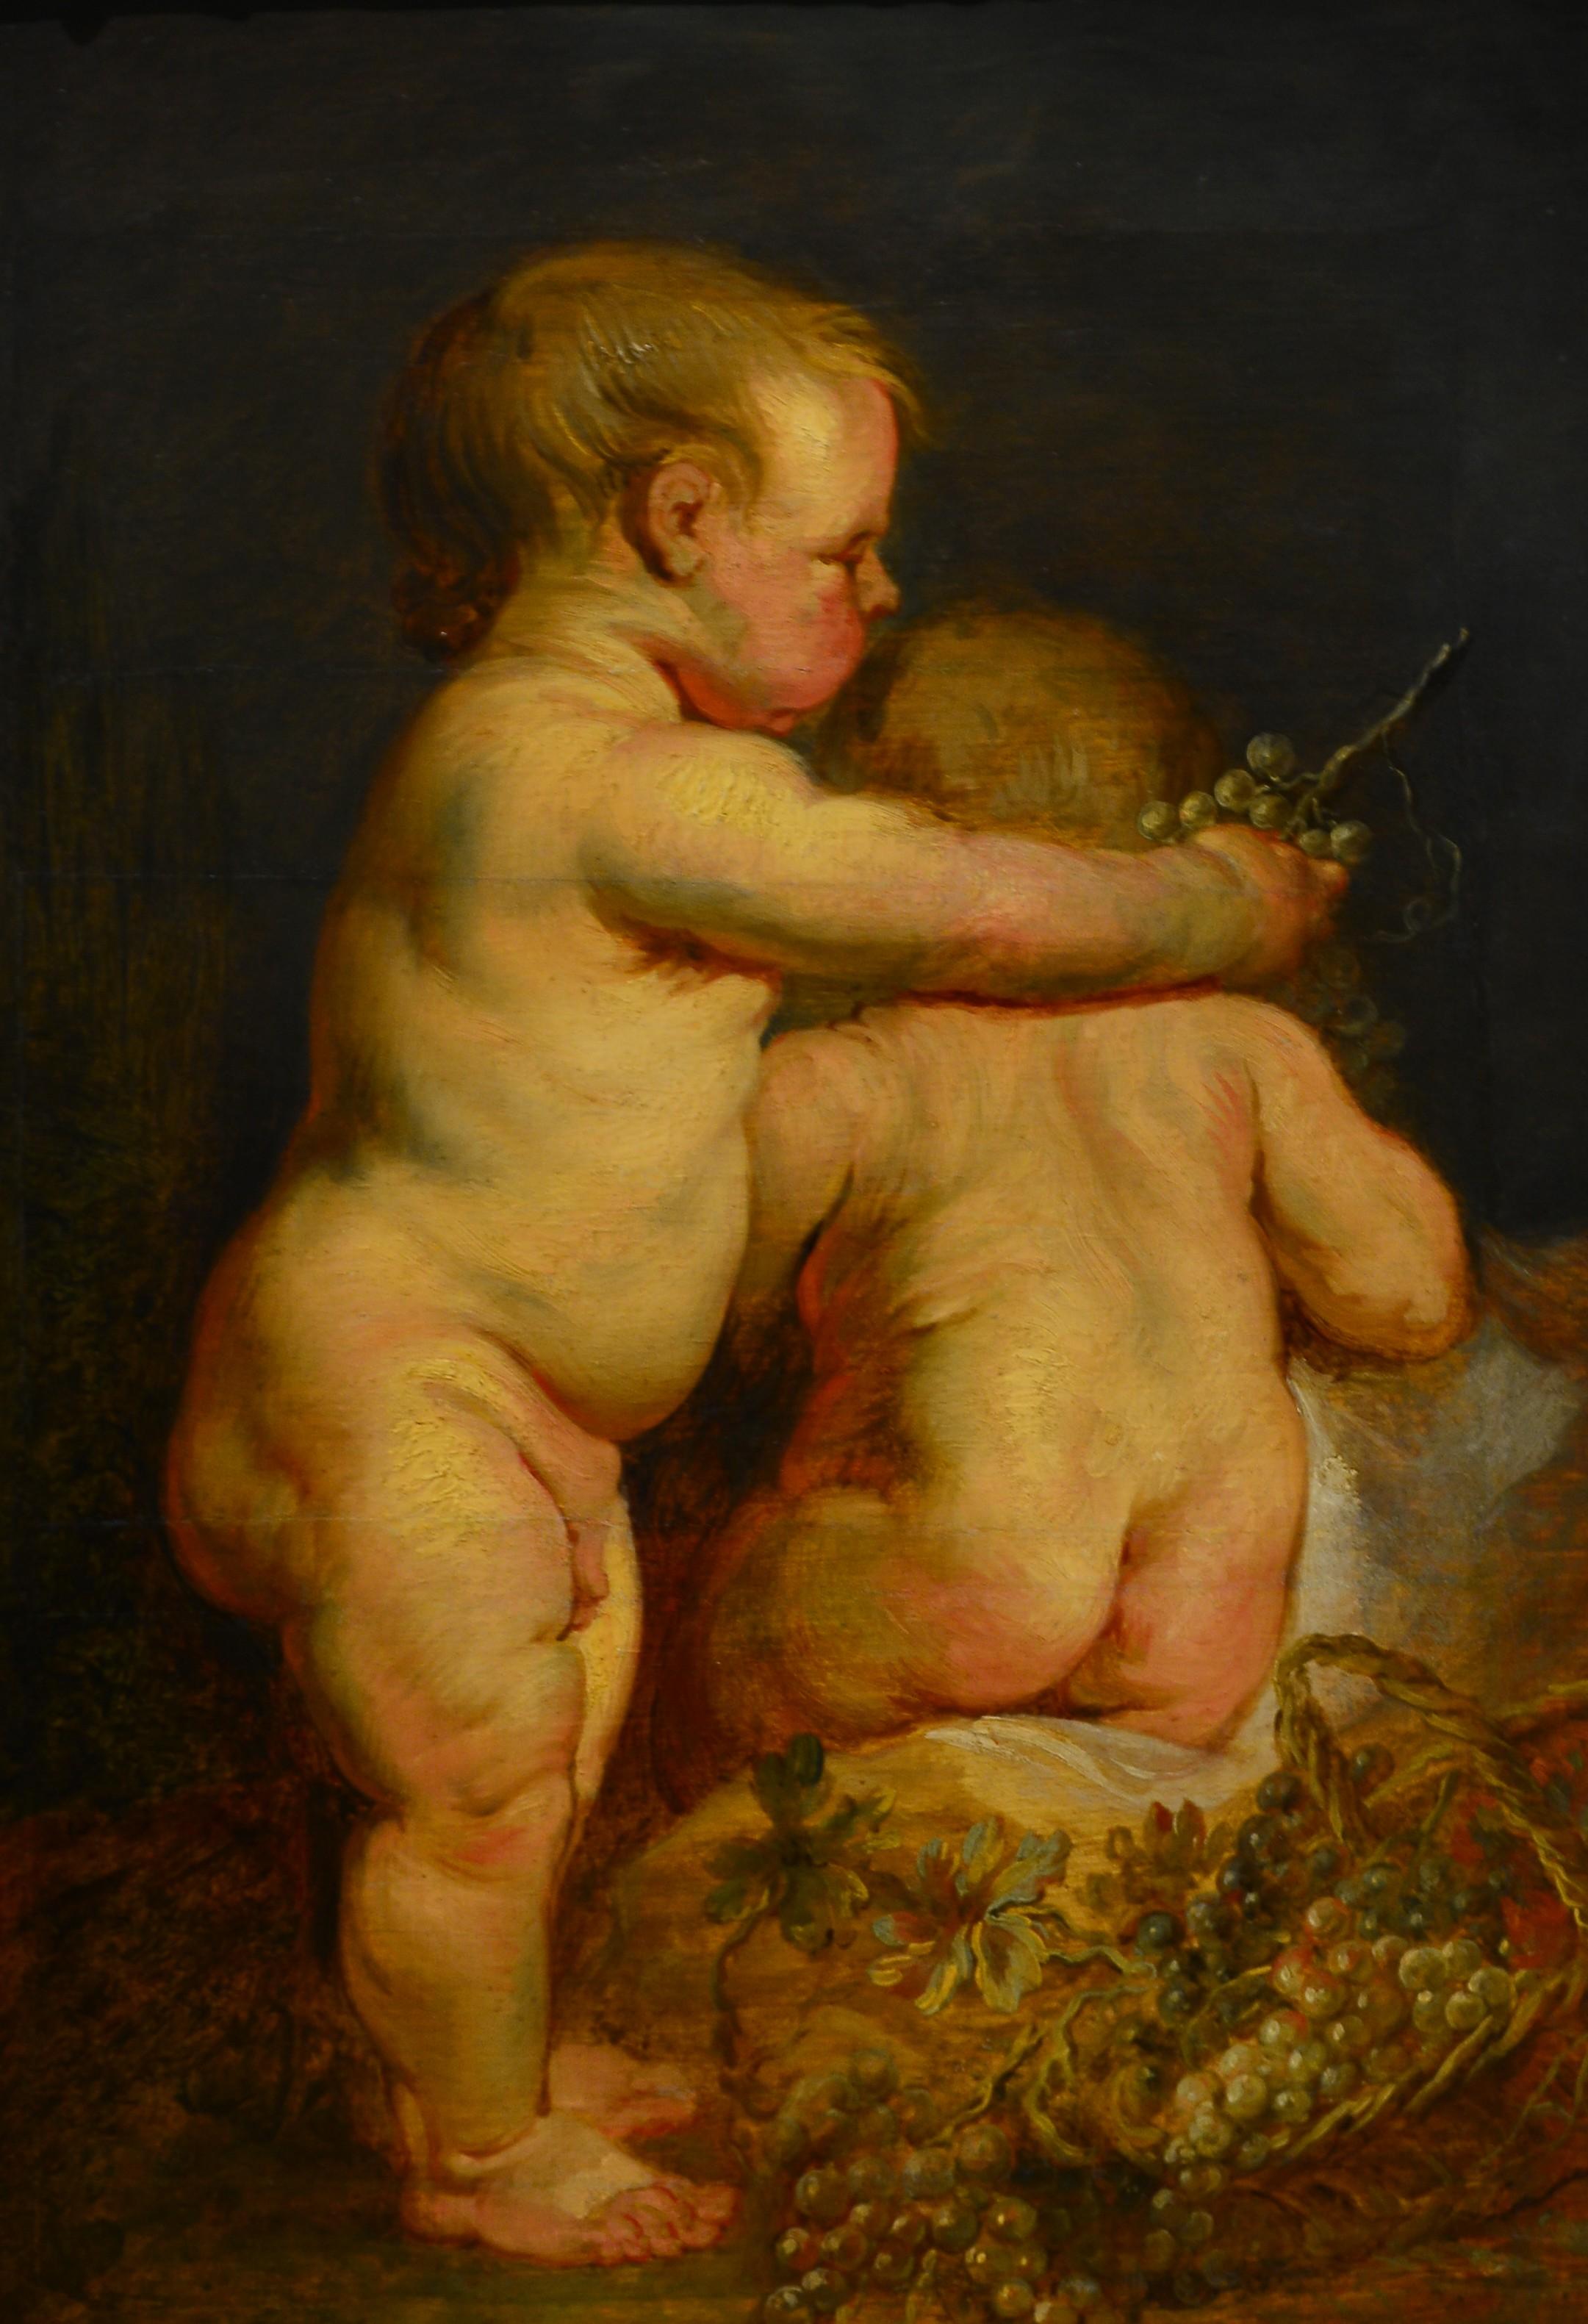 nakna barn